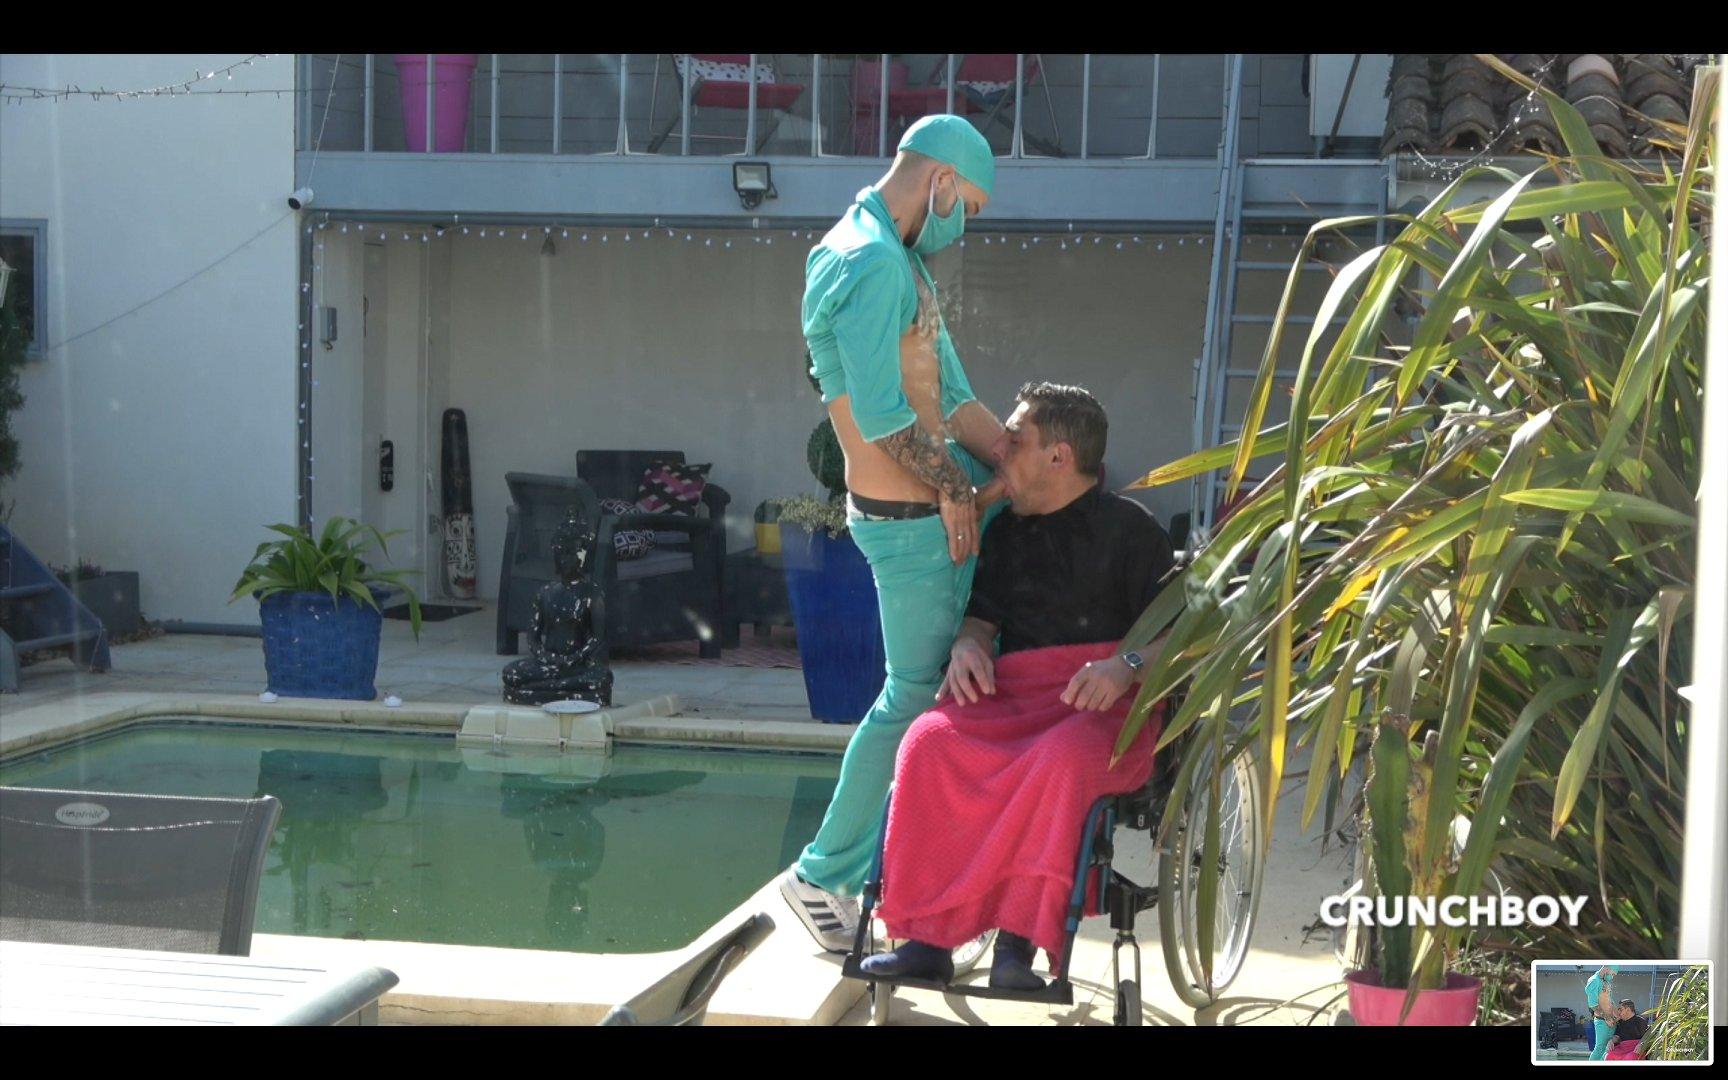 manándosela al enfermero